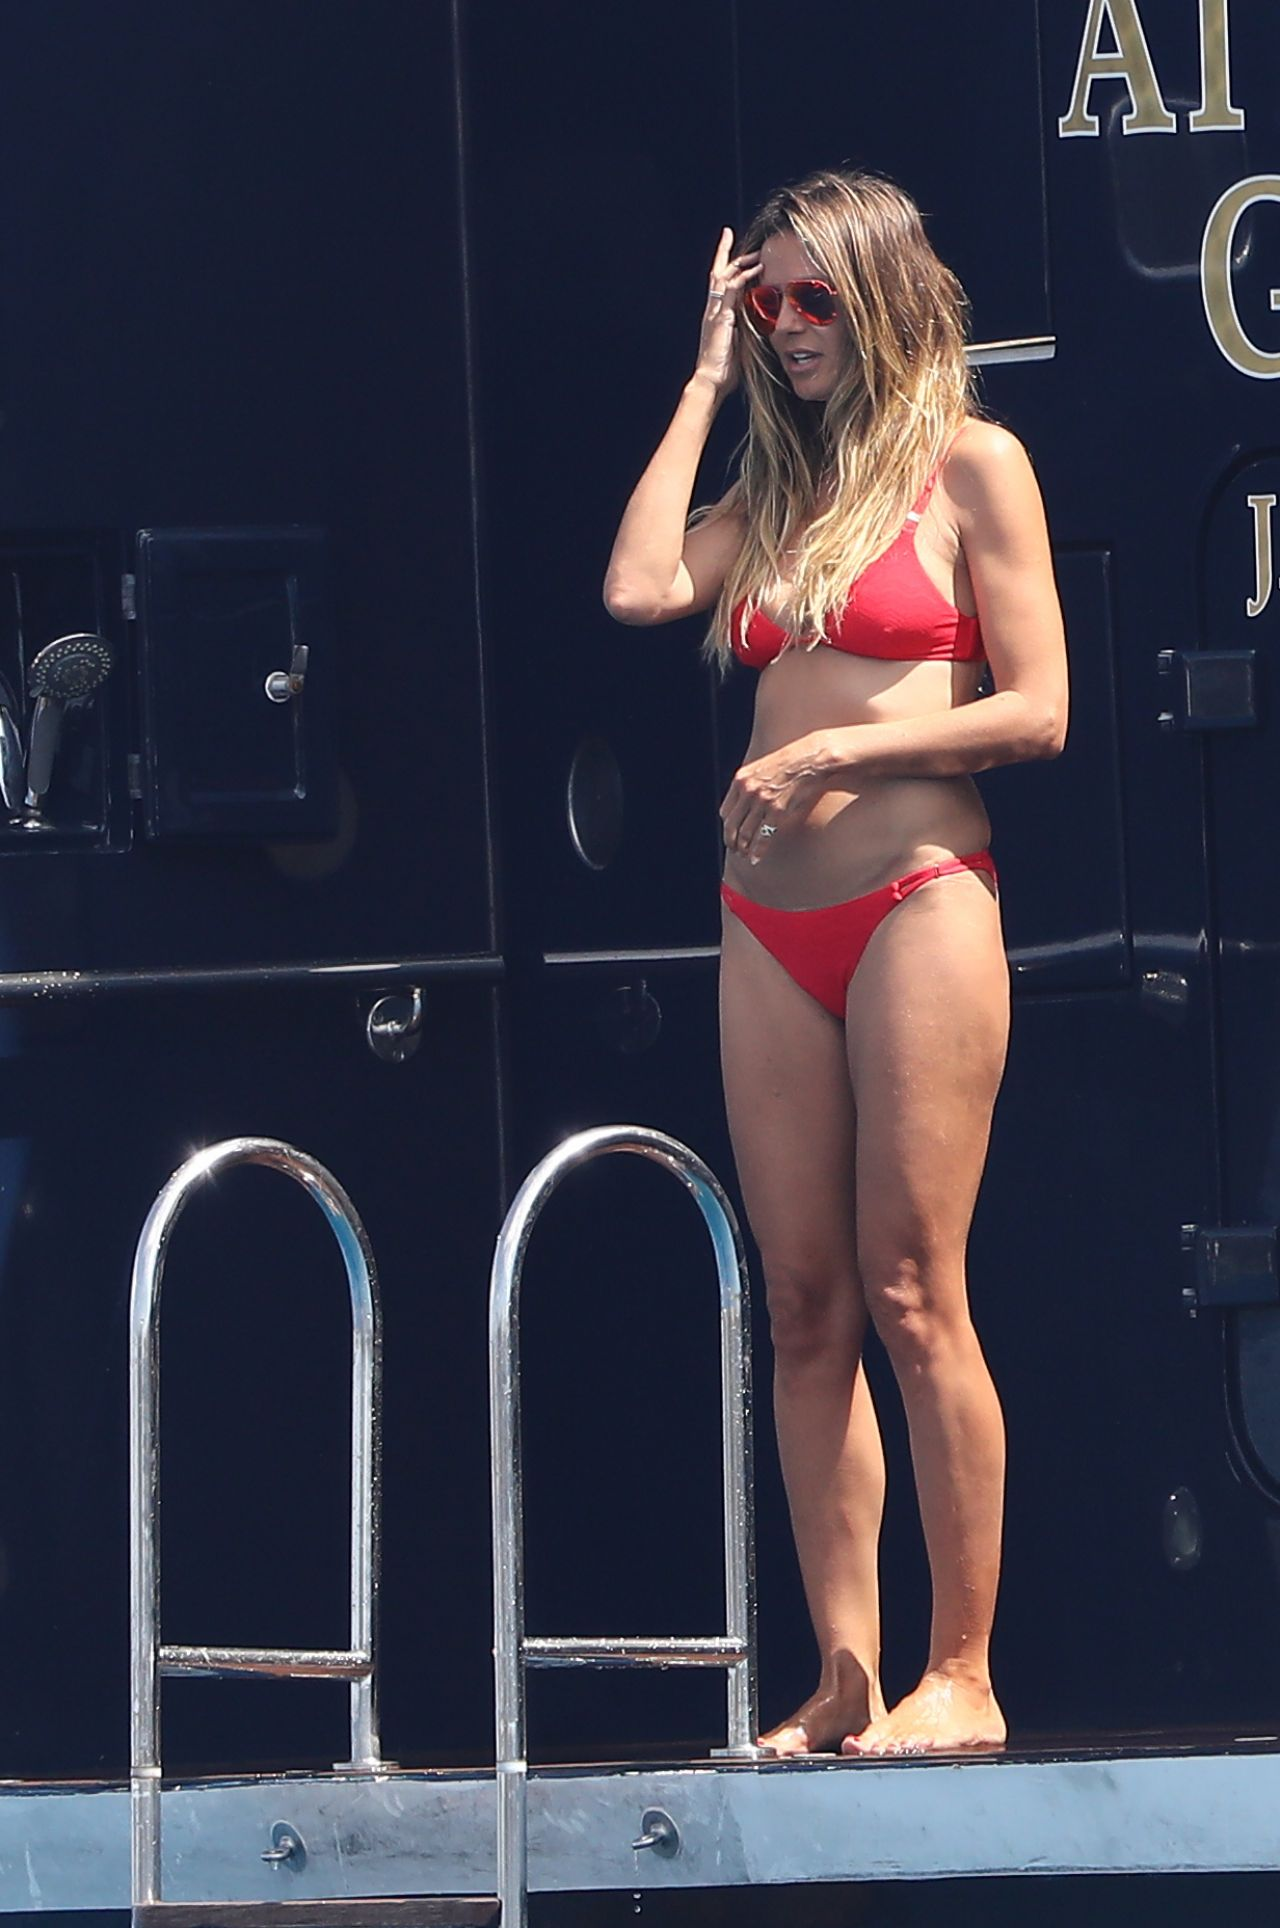 Heidi Klum in a Red Bikini on a Yacht - Saint-Tropez ...